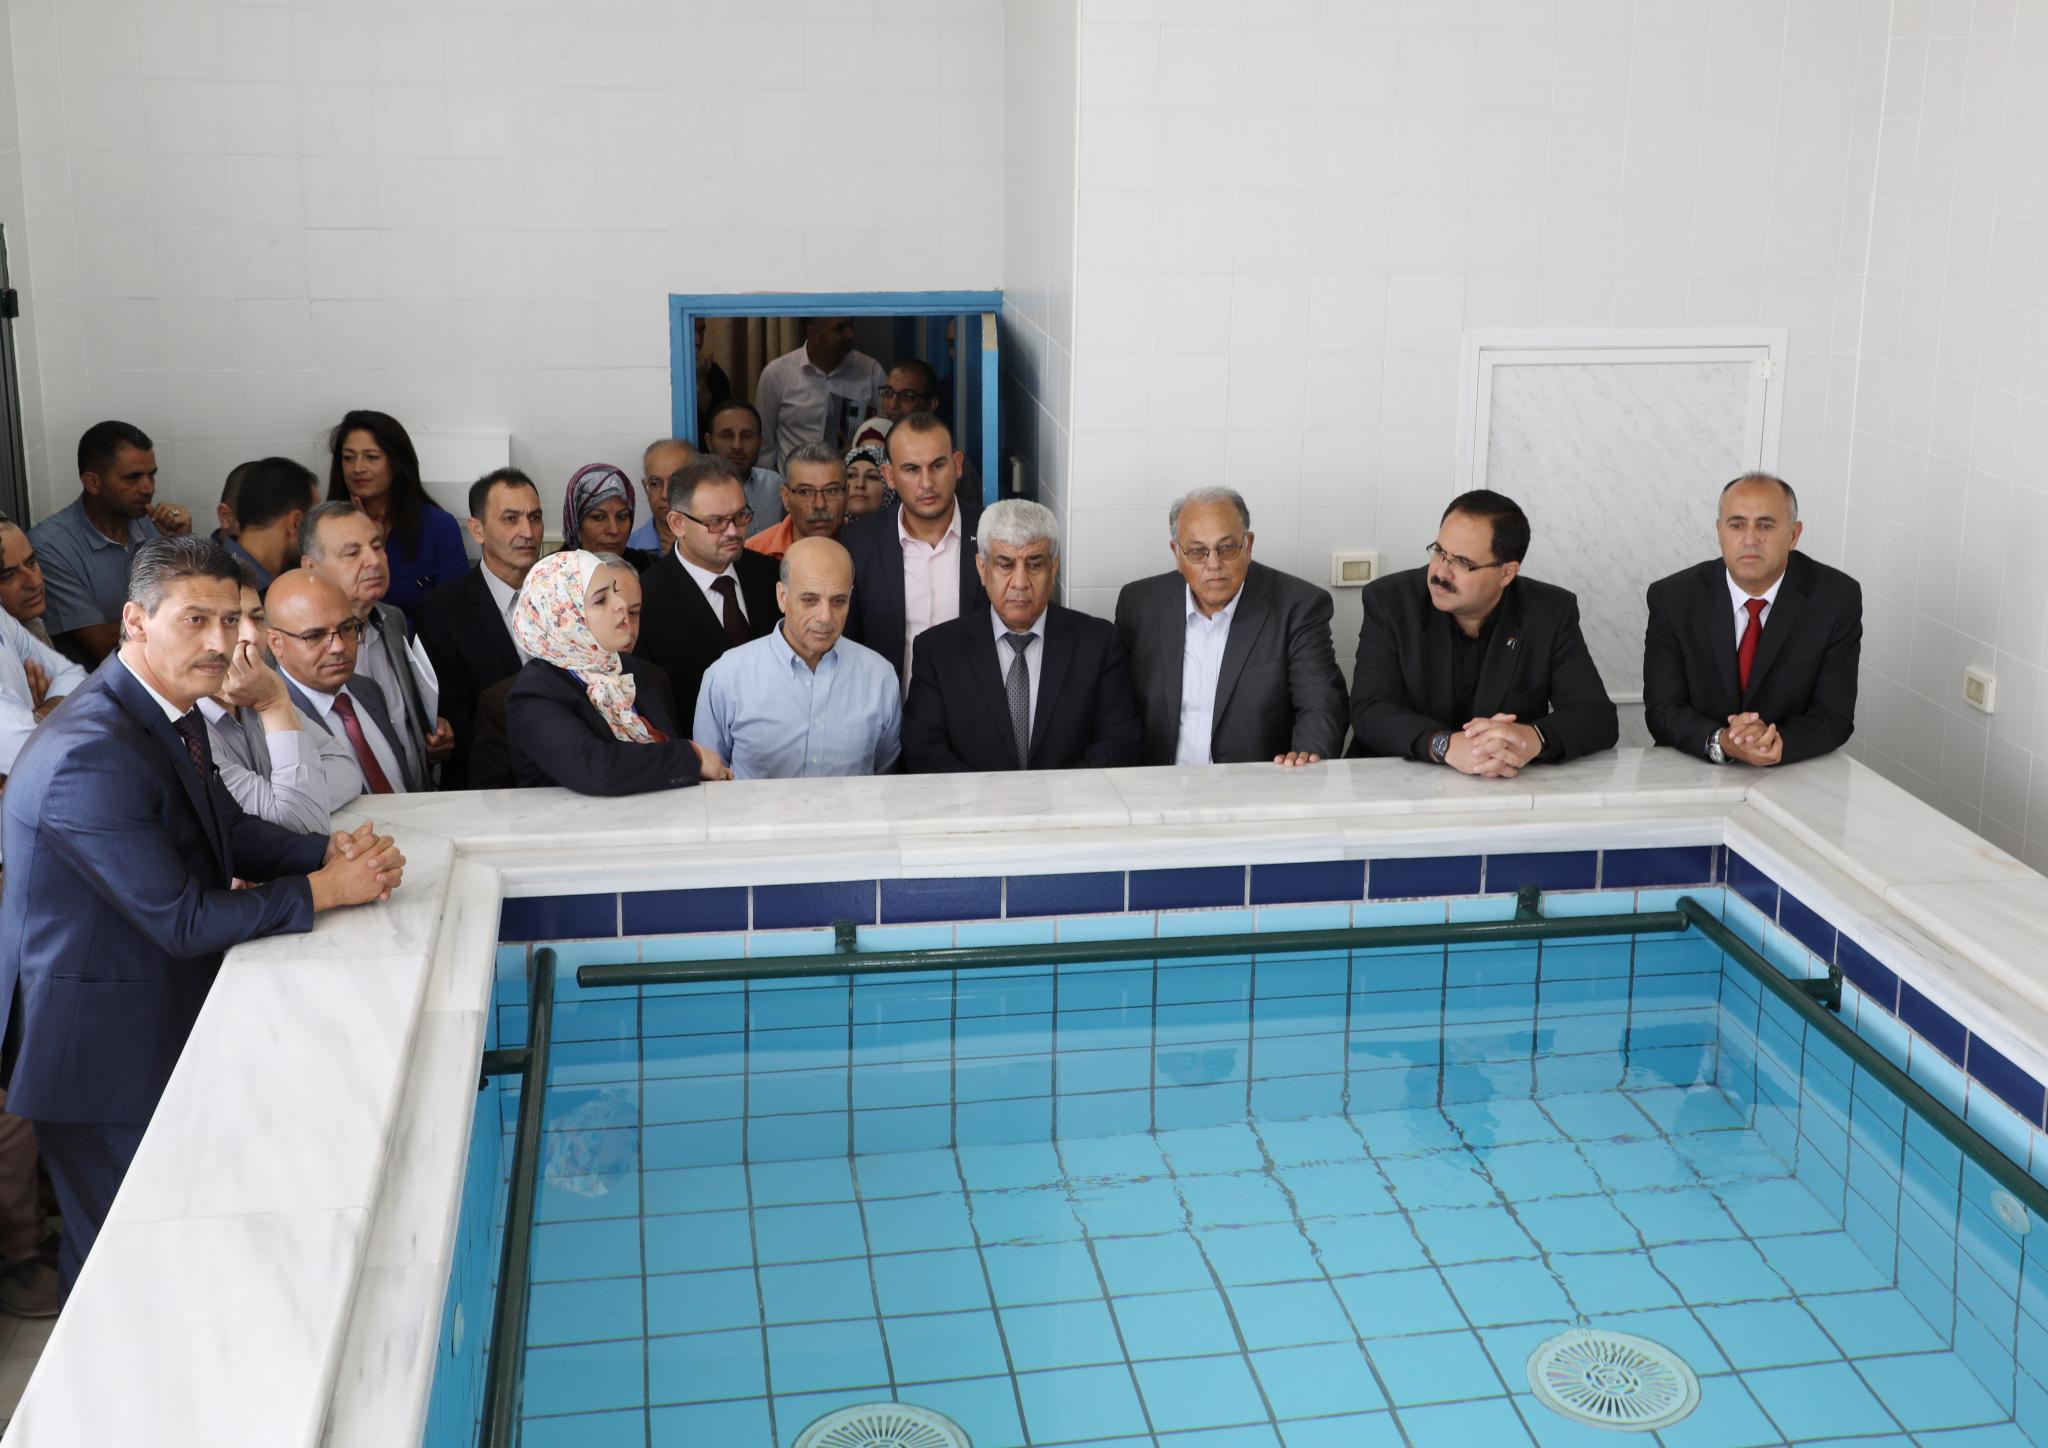 Tour in the rehabilitation centers